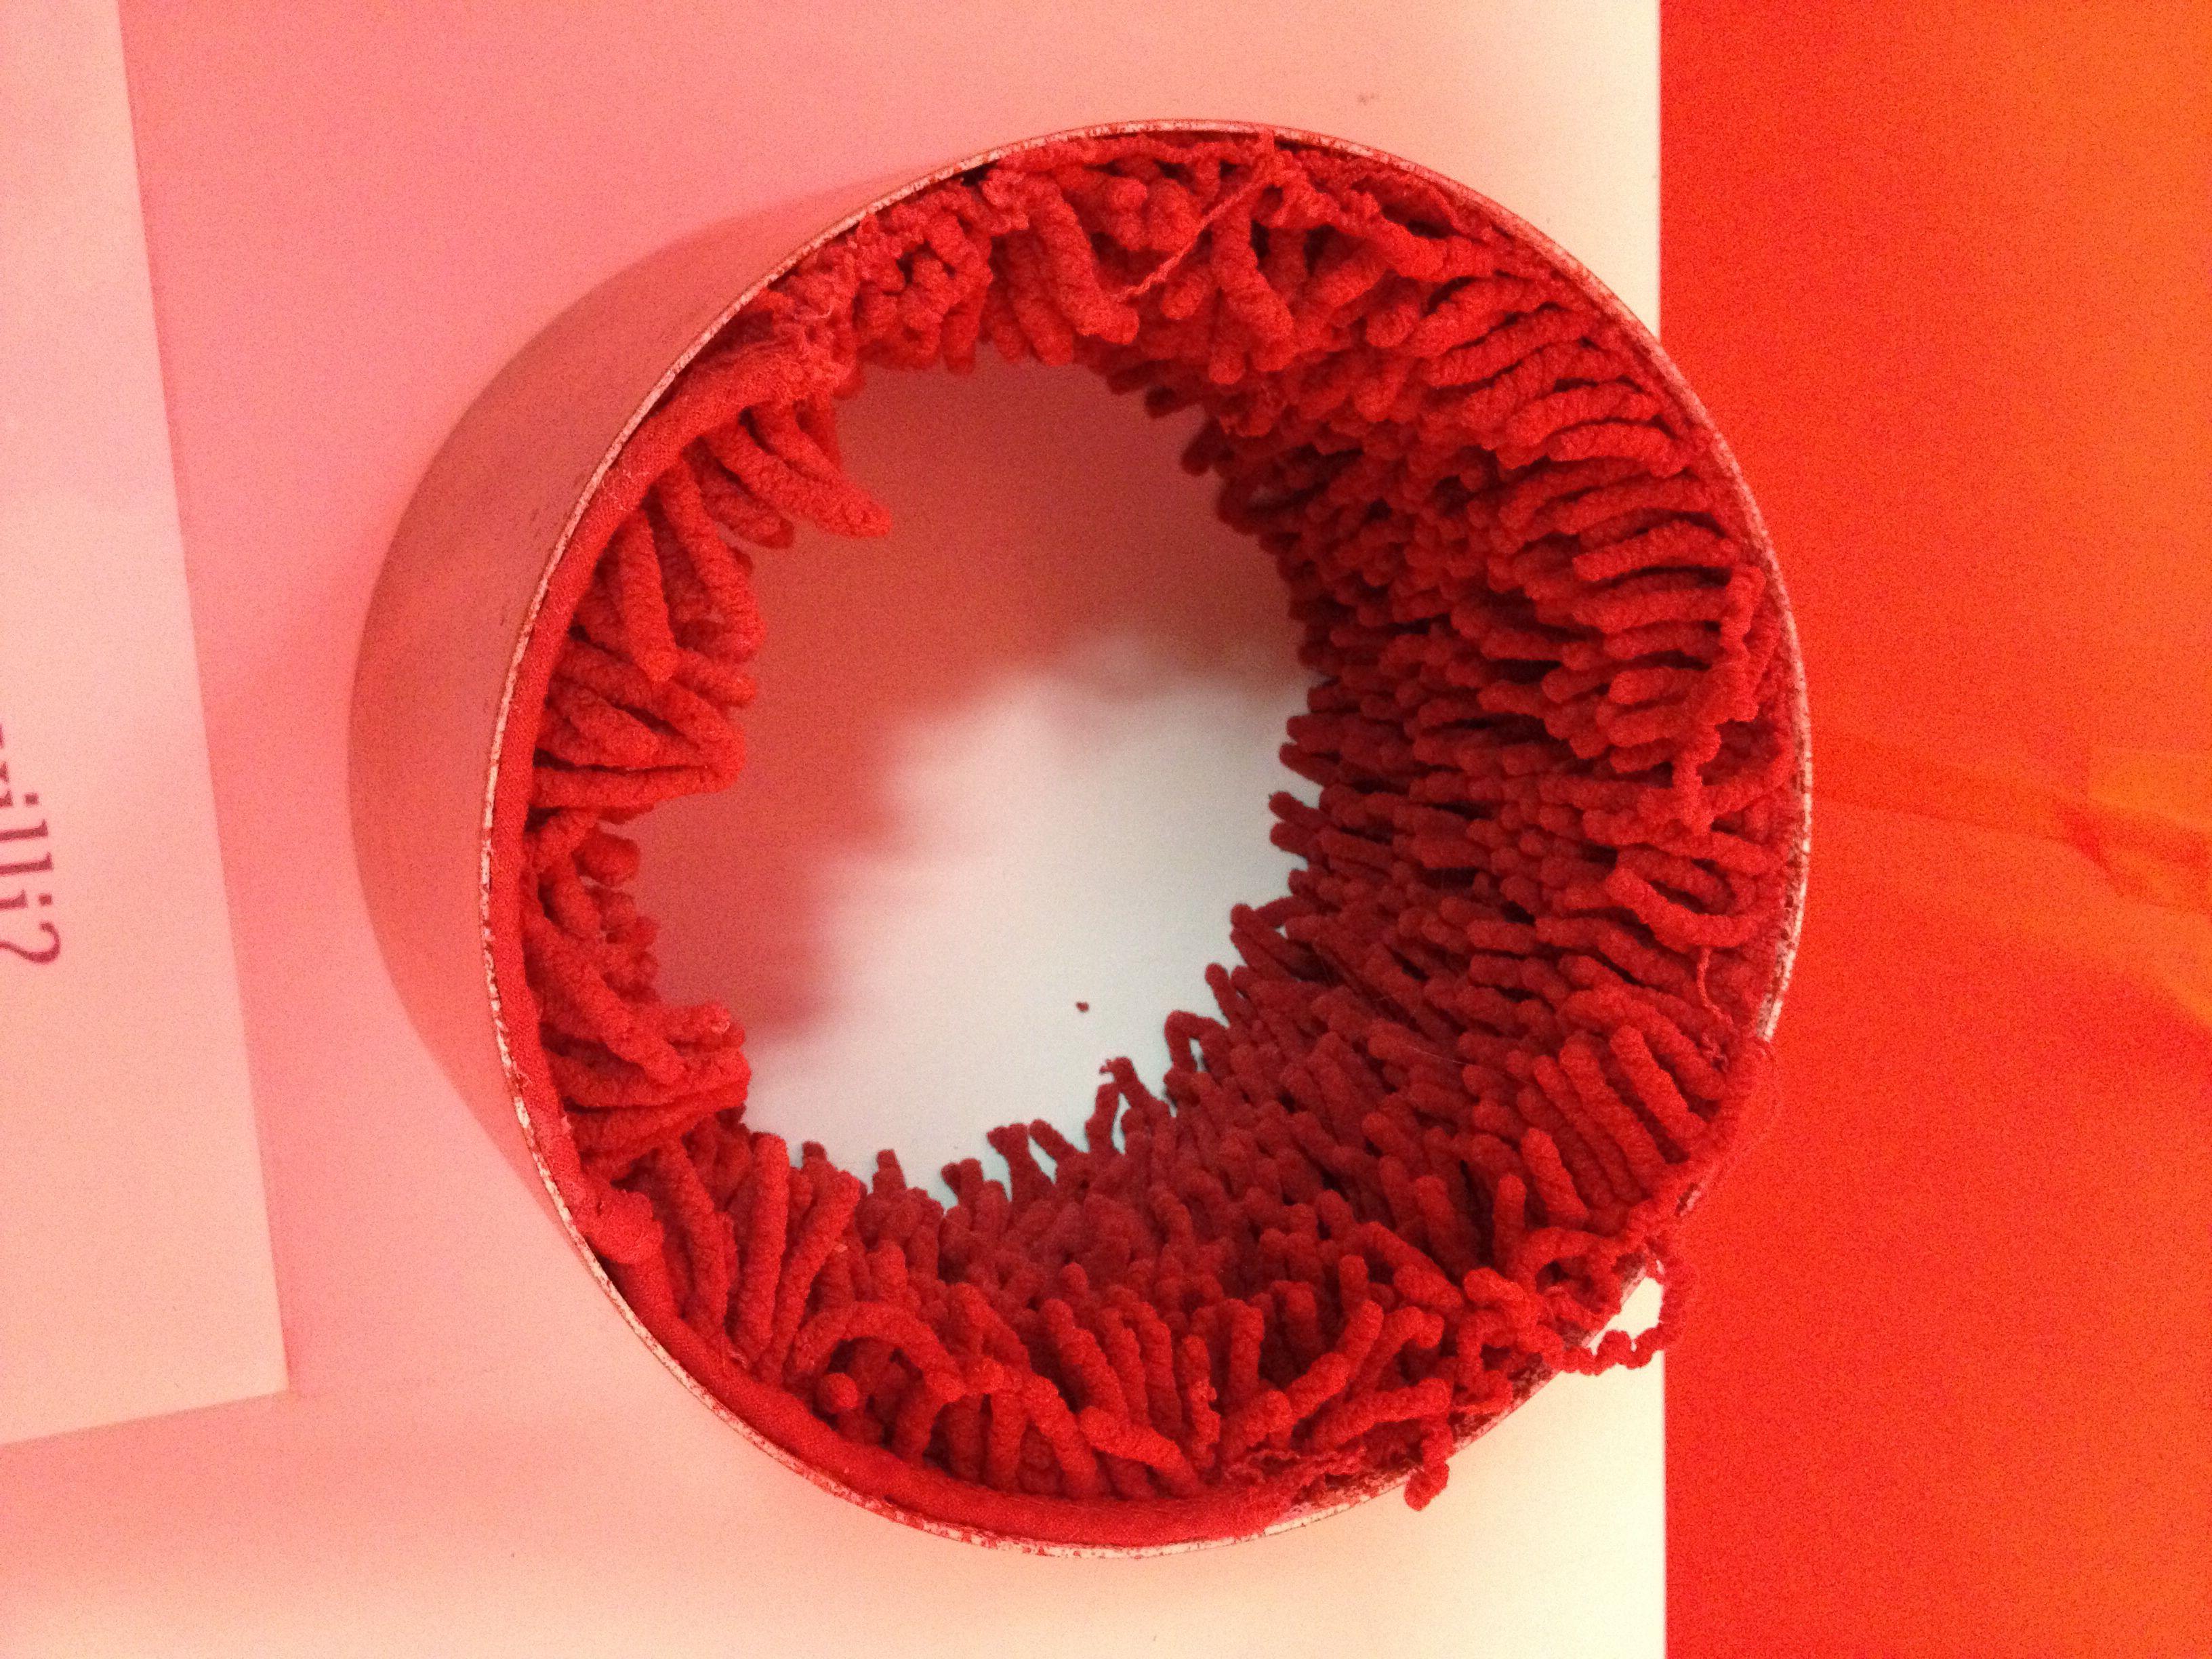 Model Showing Villi Inside Intestine